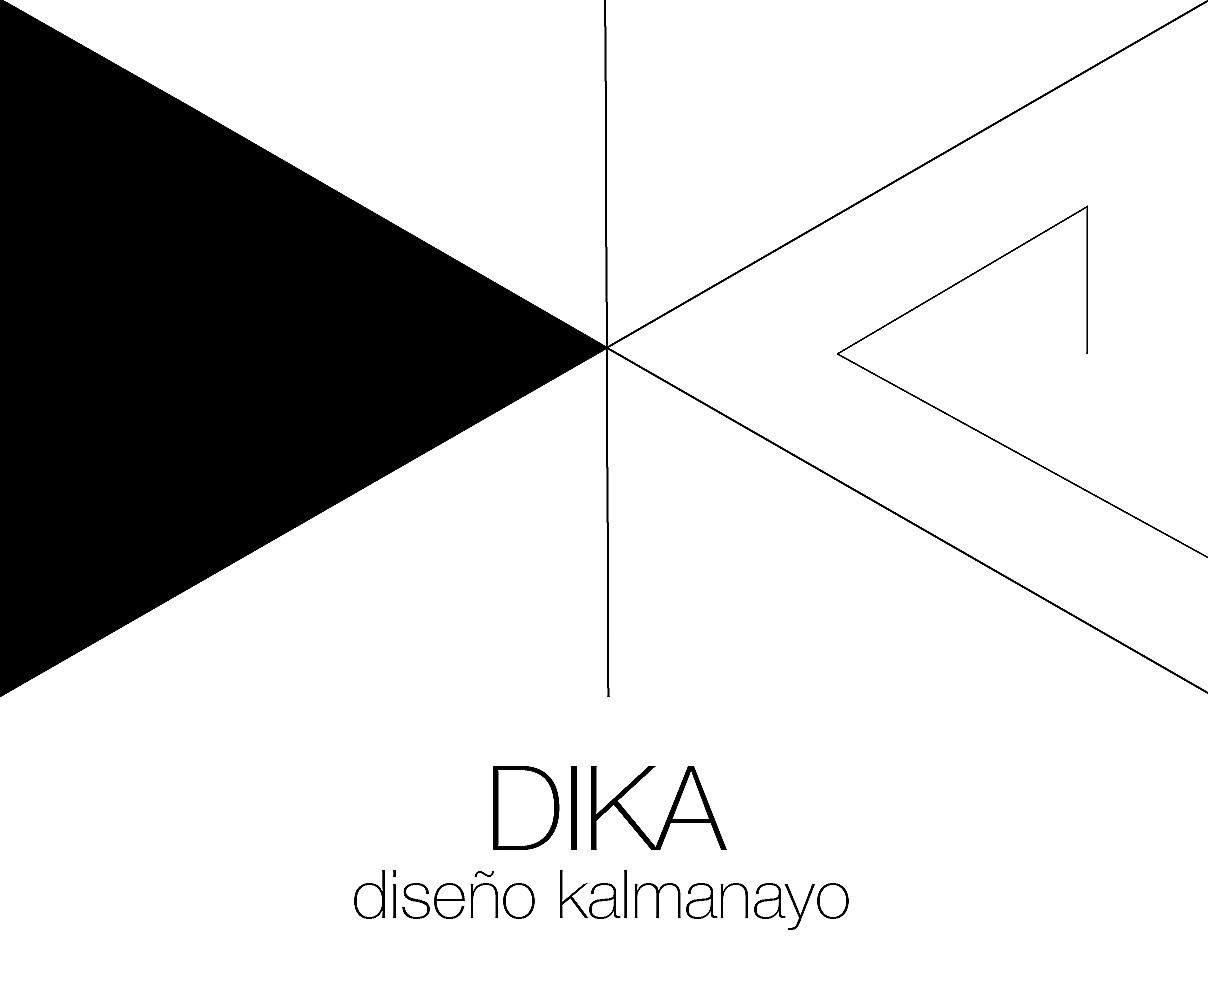 Dika Diseño Kalmanayo